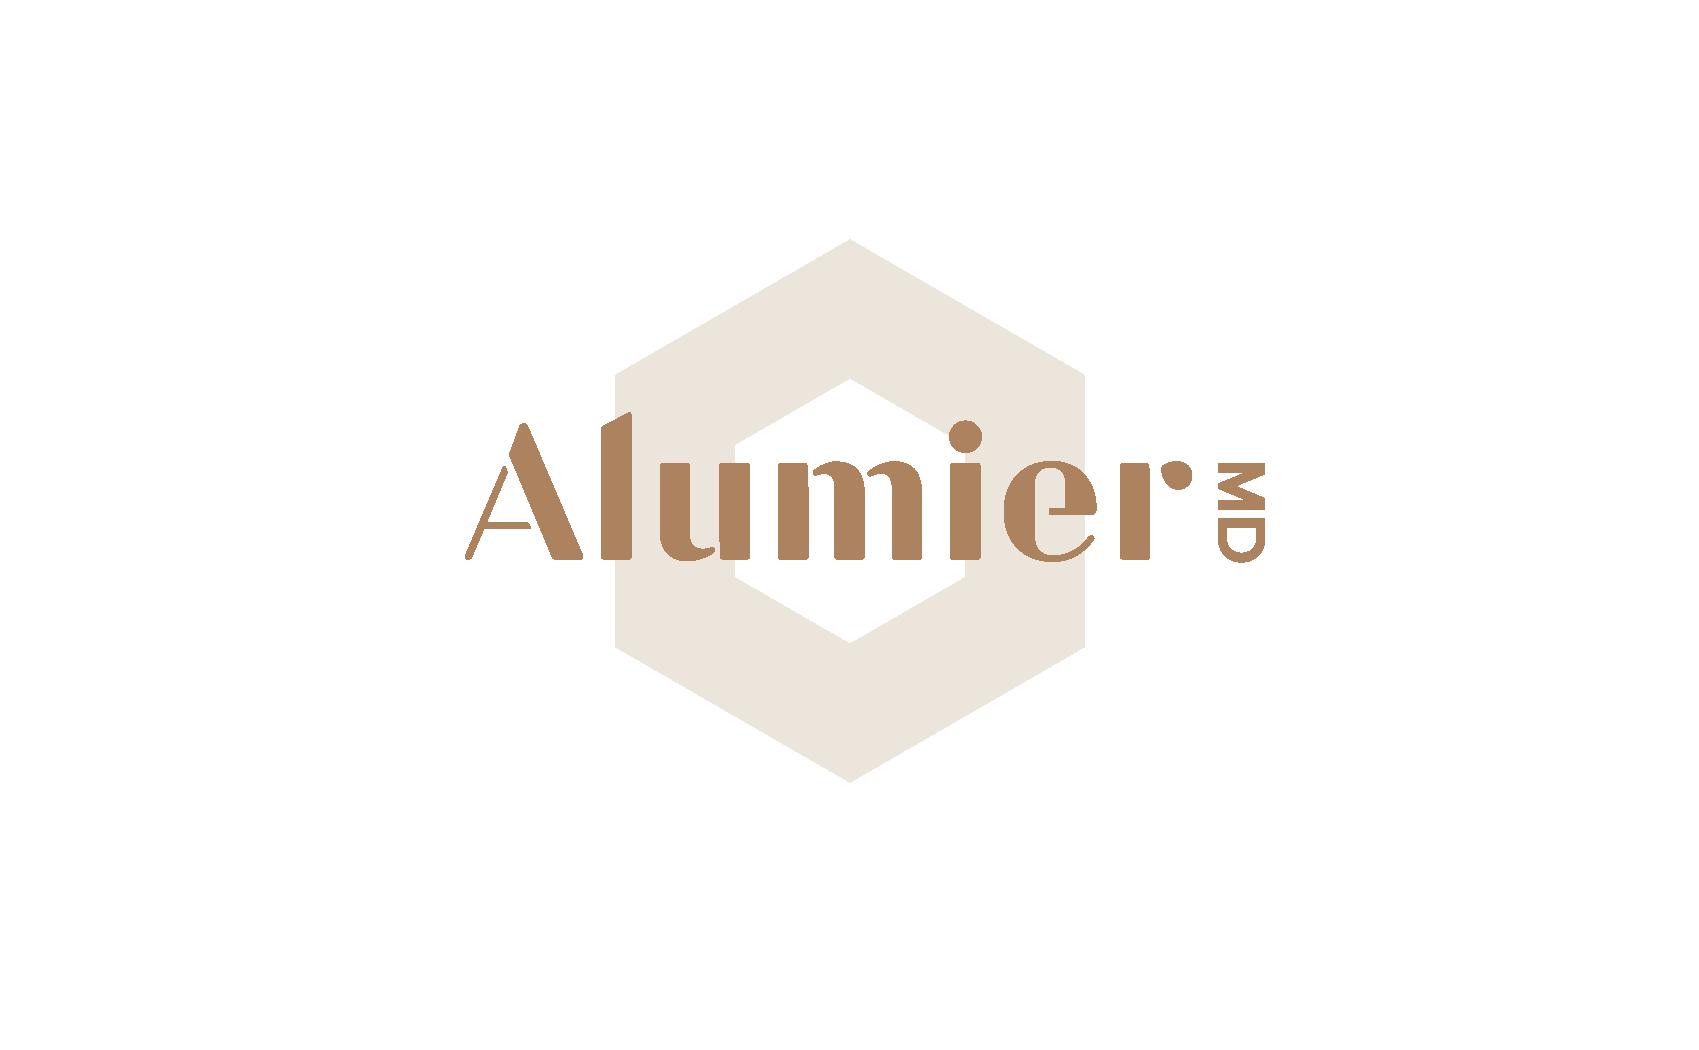 Alumier Brand Logo